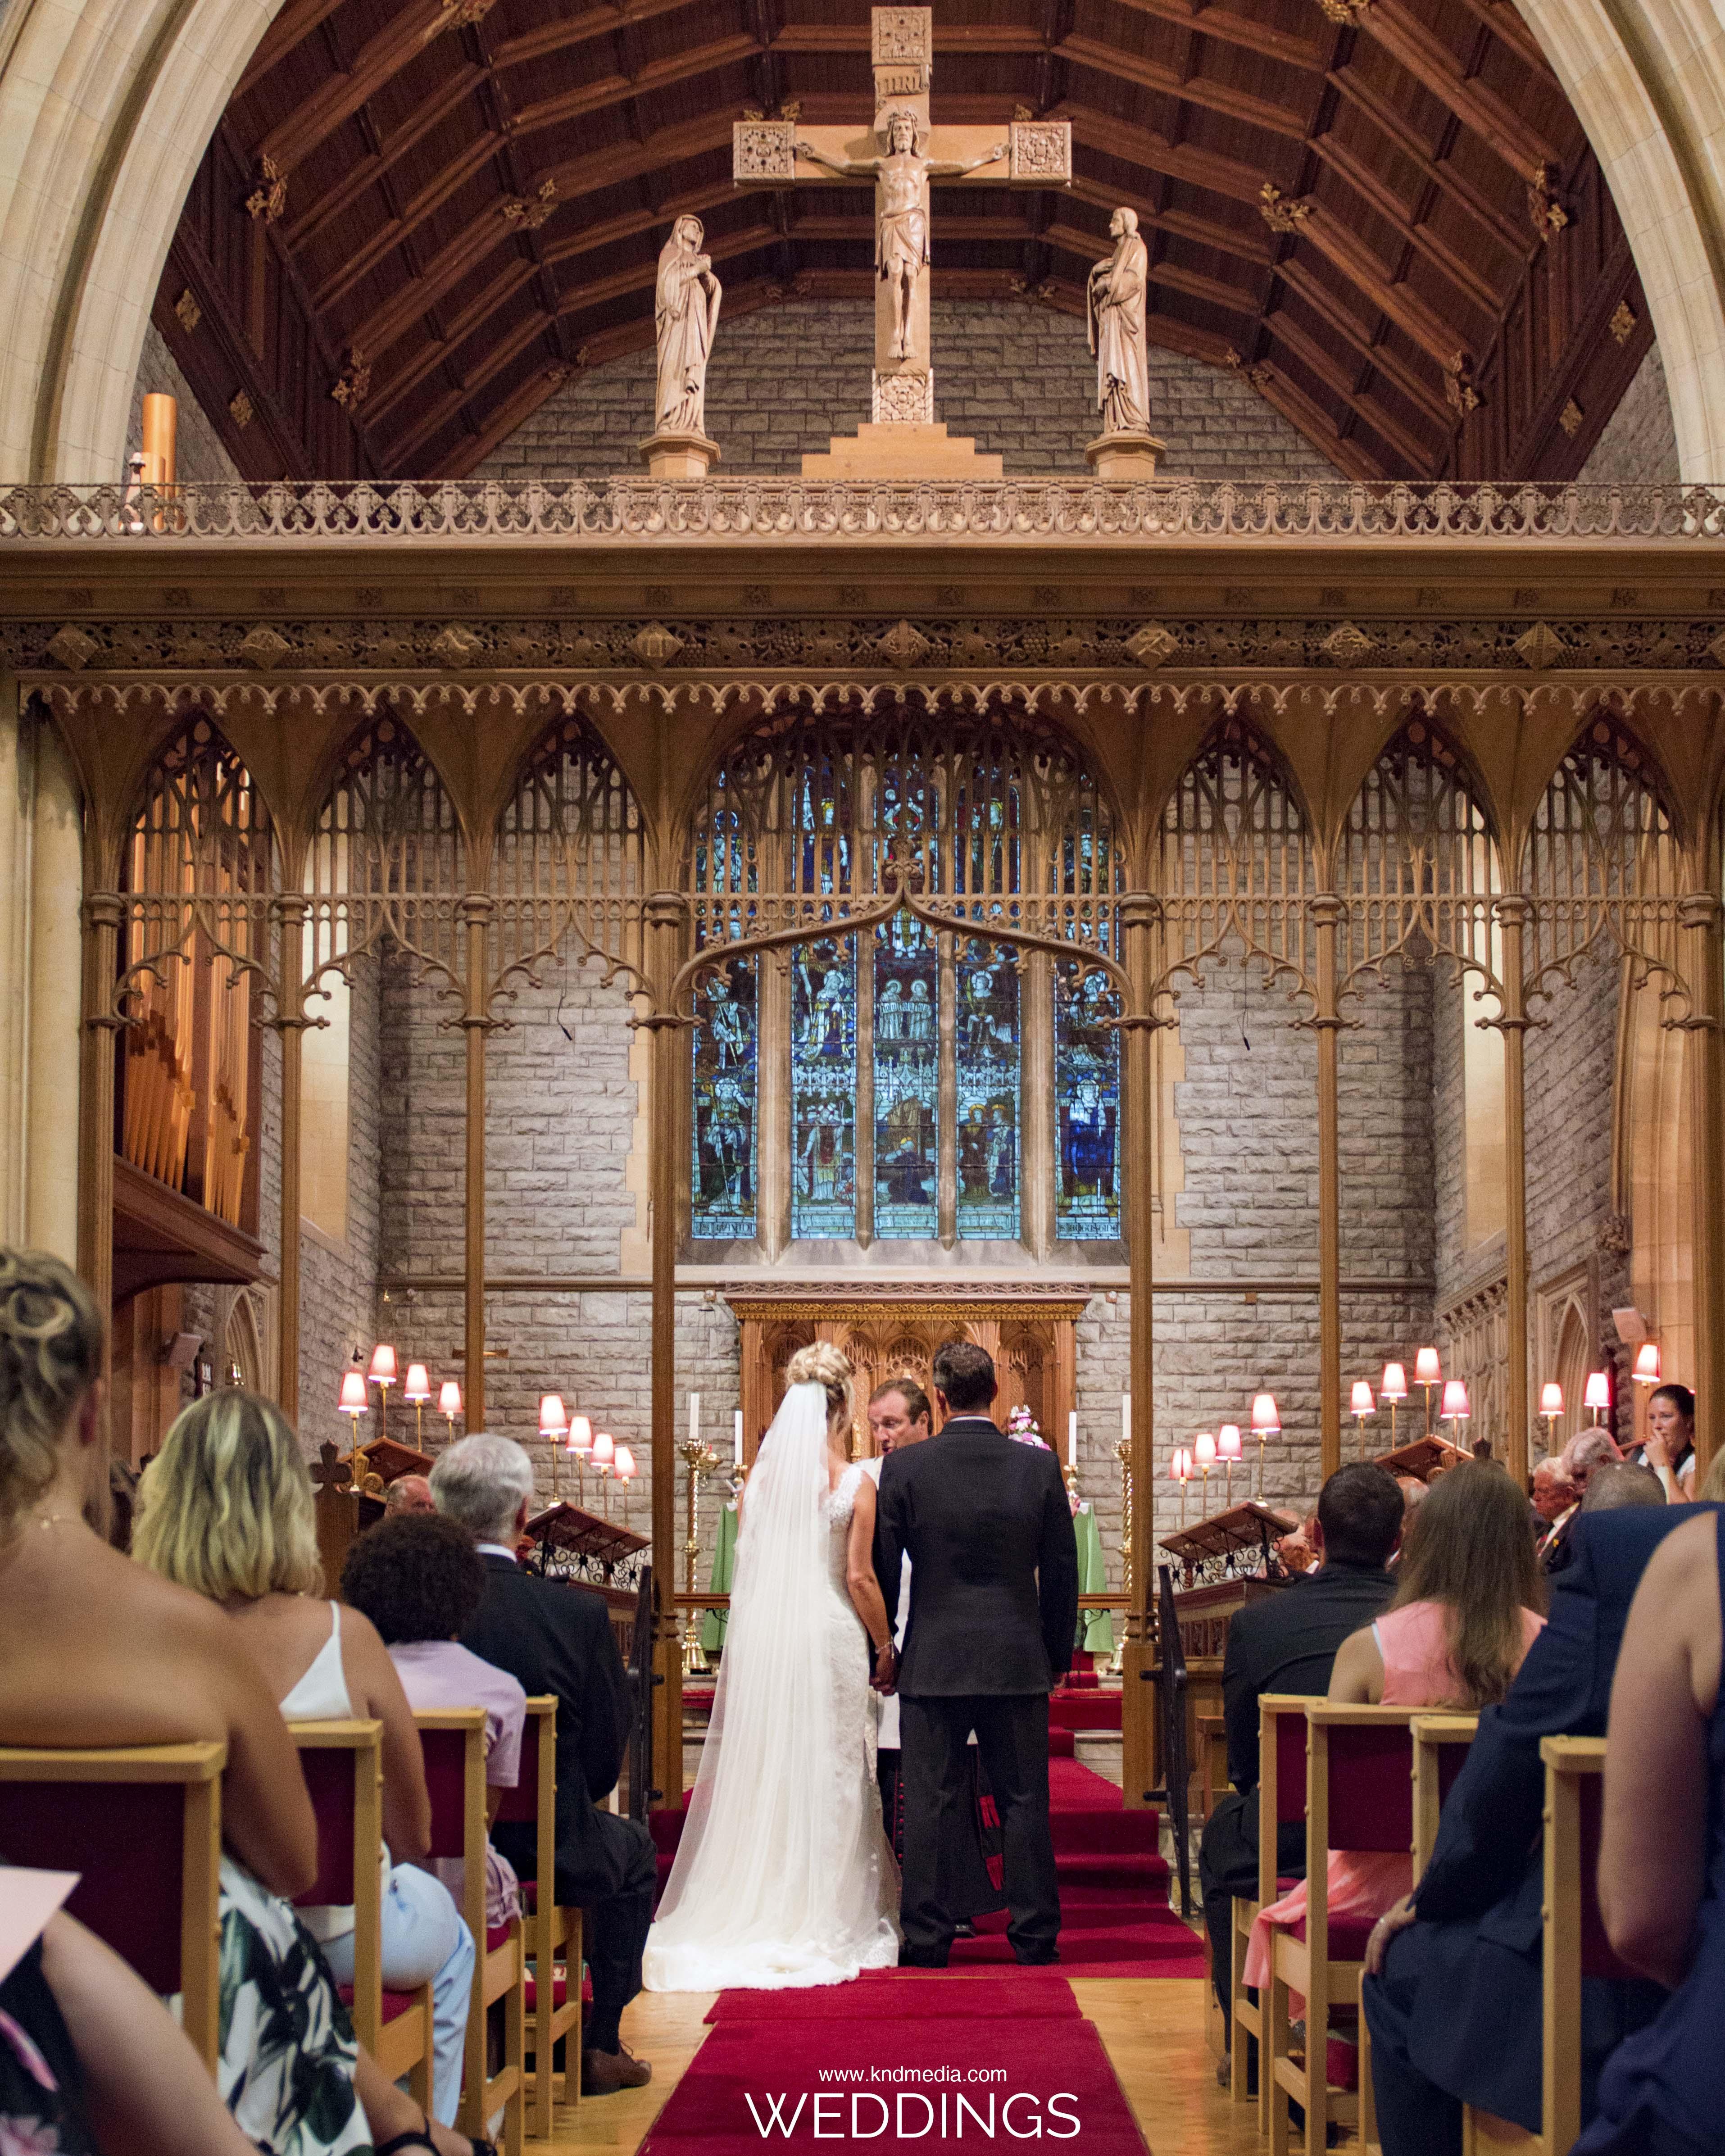 KND Media Weddings - Church Ceremony